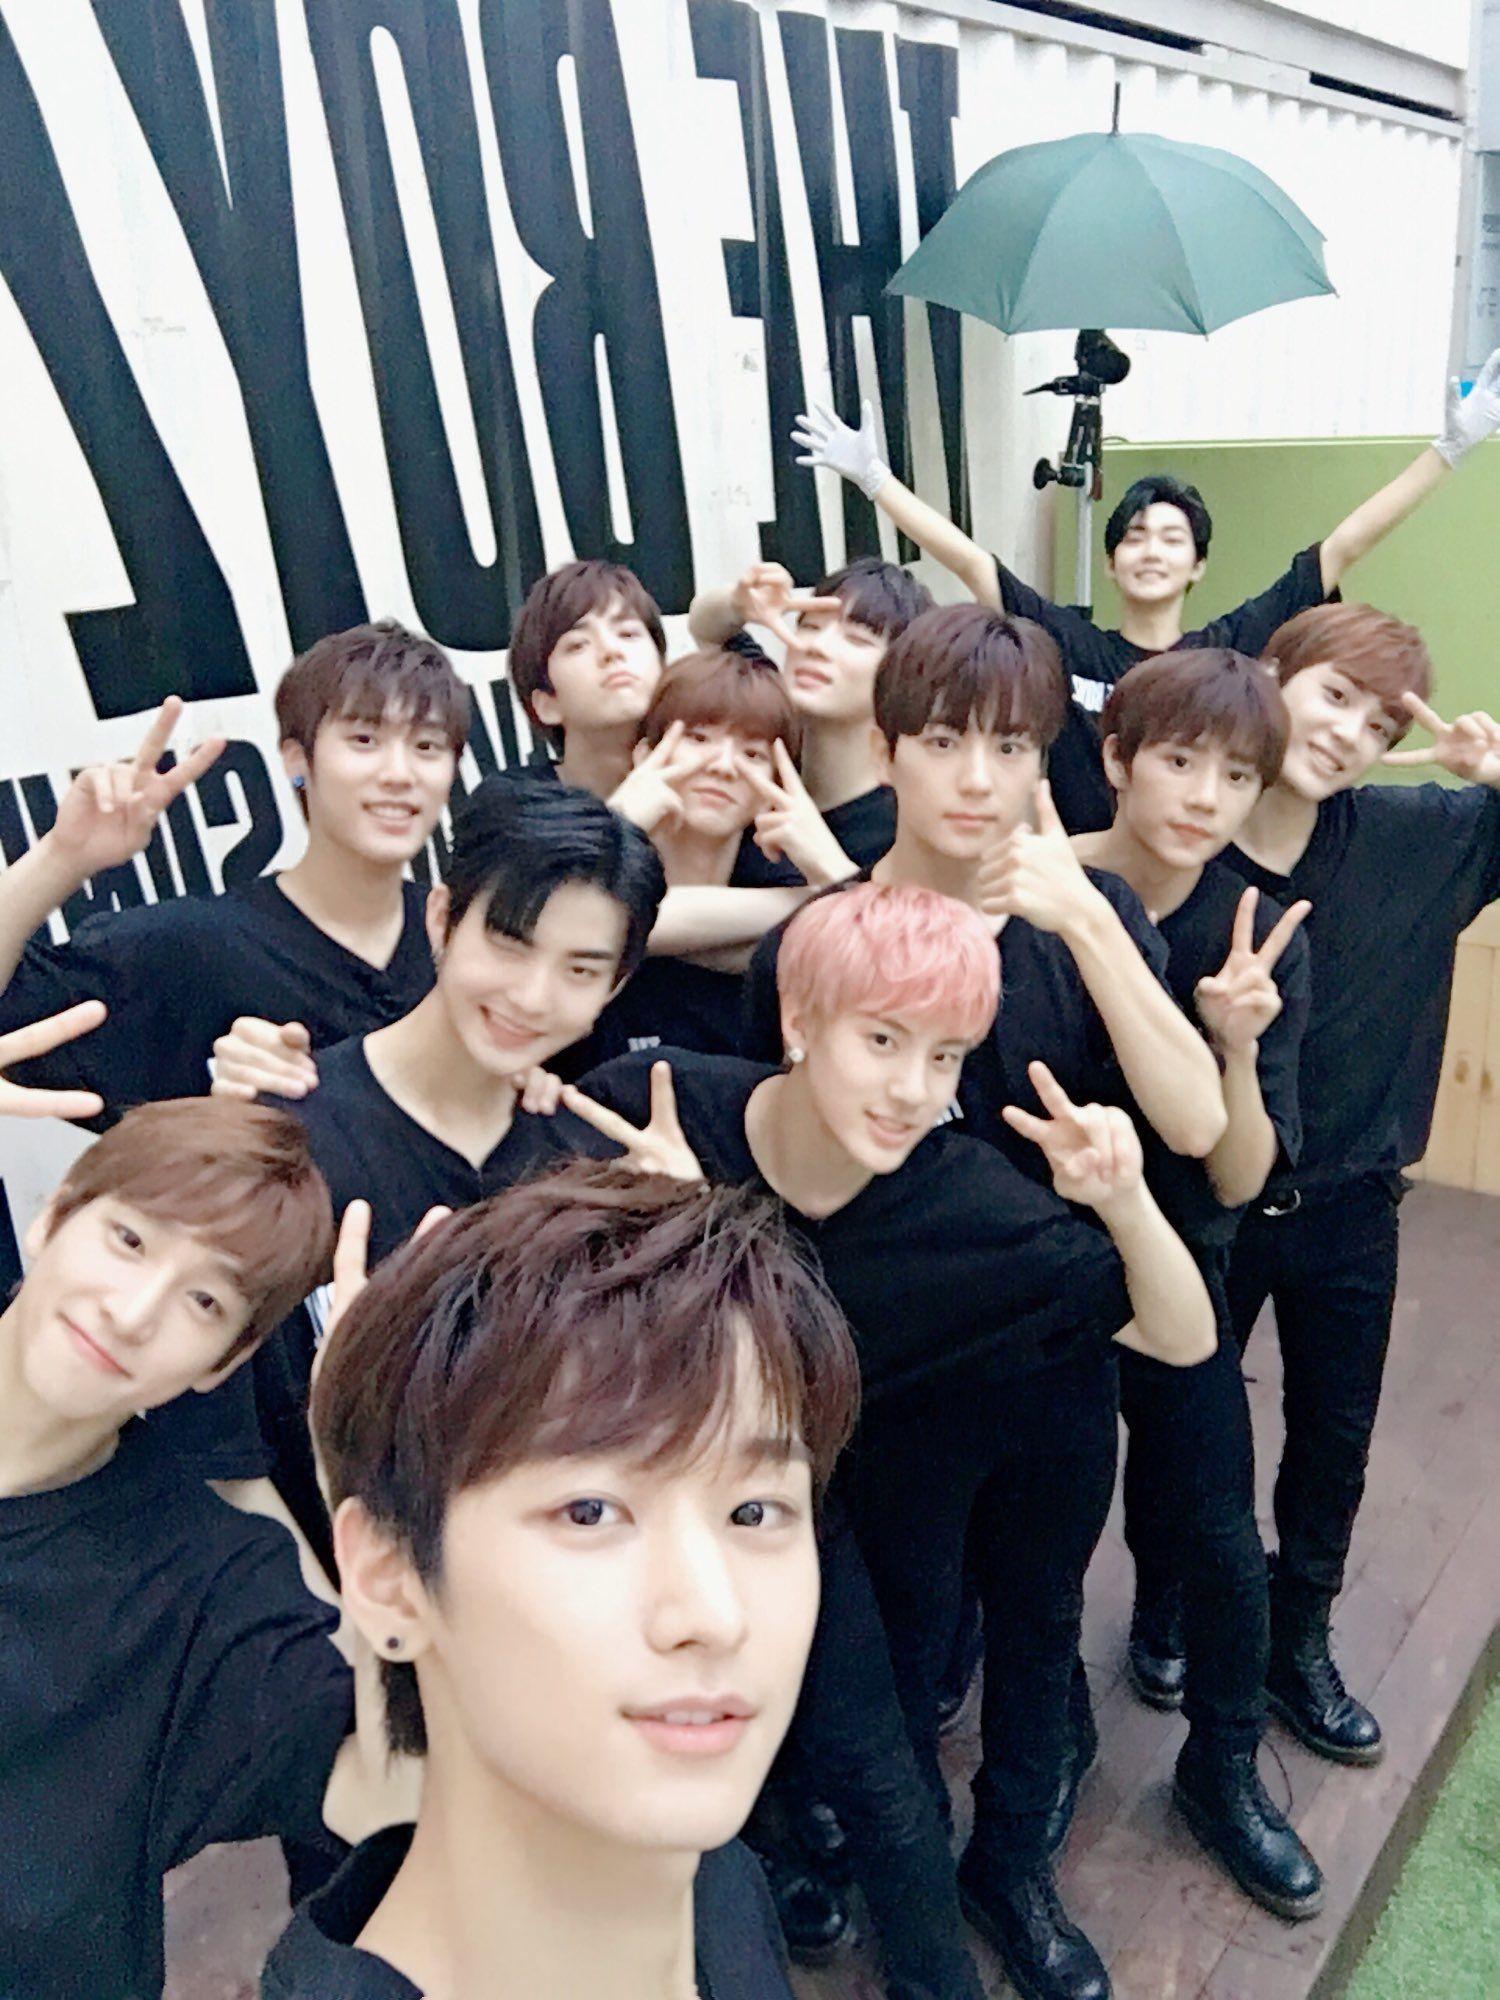 The Boyz New Idol Group Boy Groups Celebrities Kpop